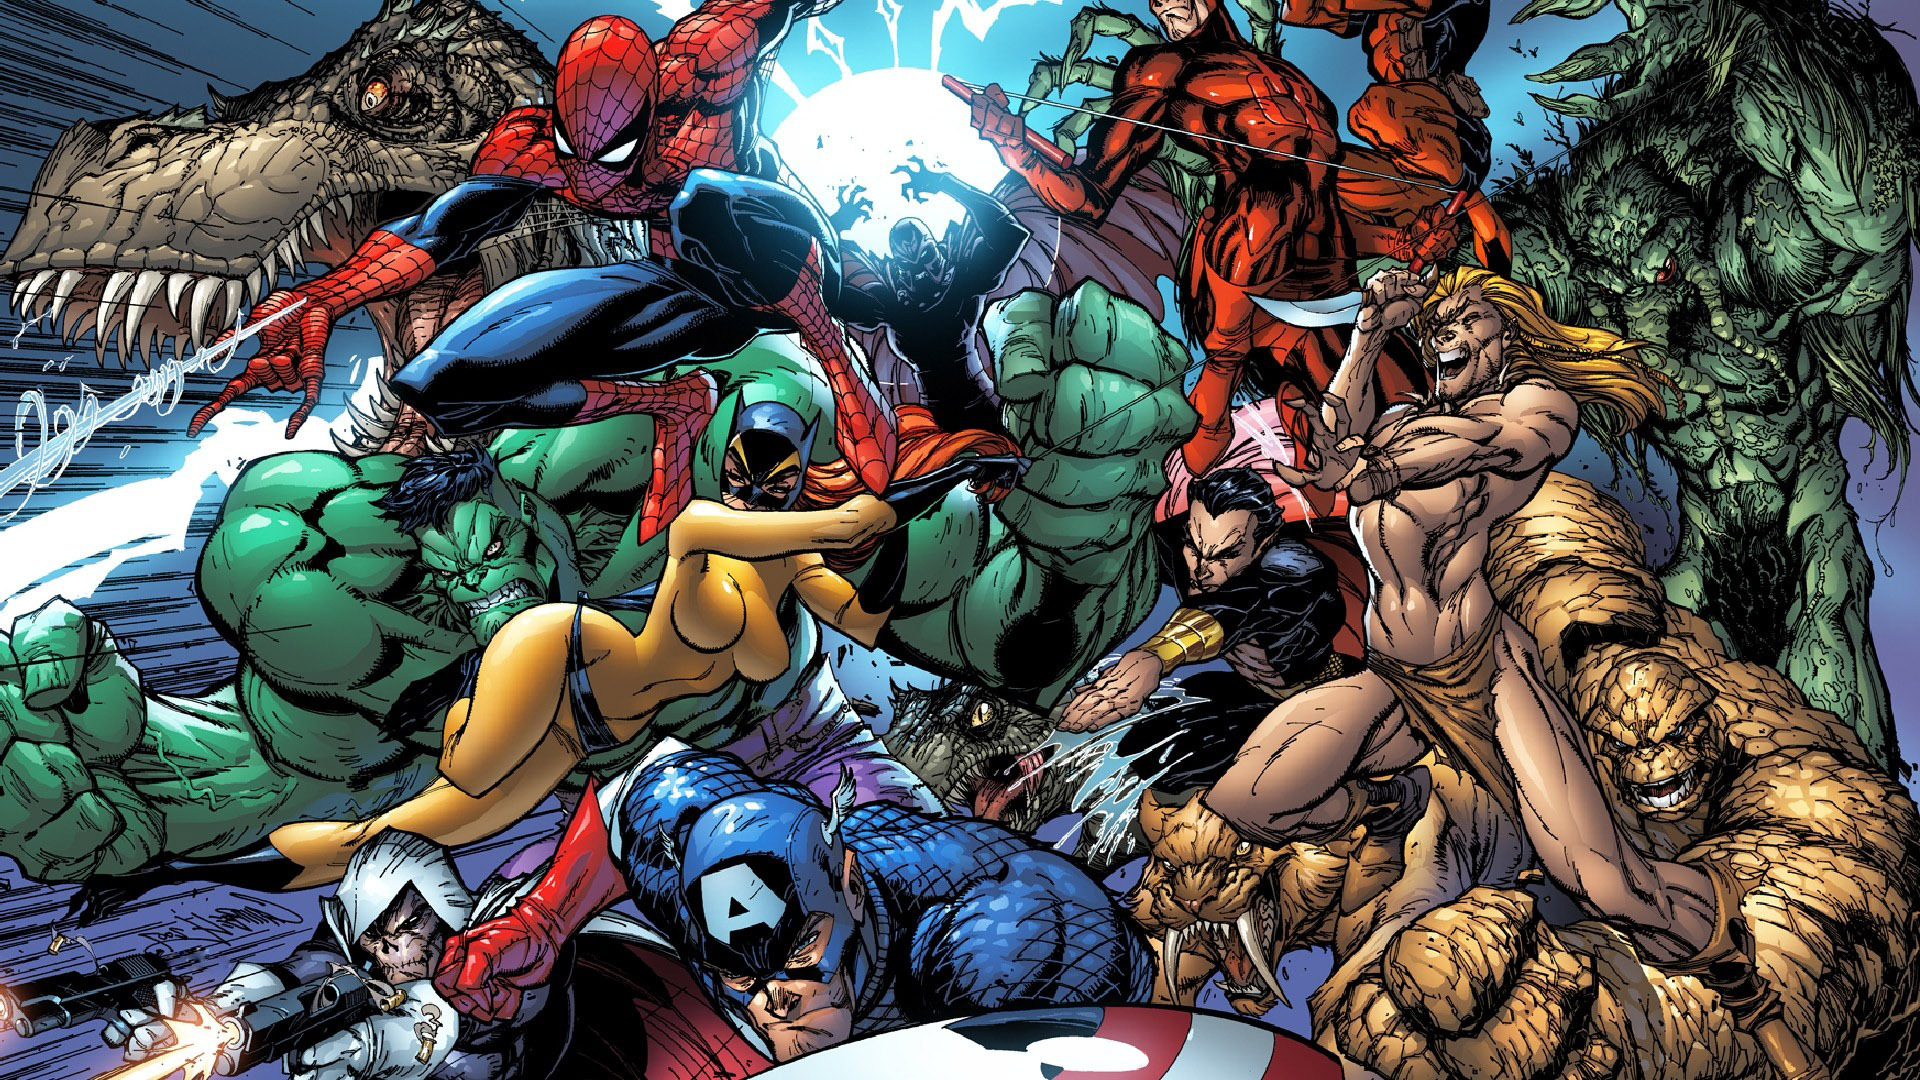 Marvel hero wallpaper wallpapersafari marvel superheroes wallpaper 4879 1920x1080 voltagebd Image collections